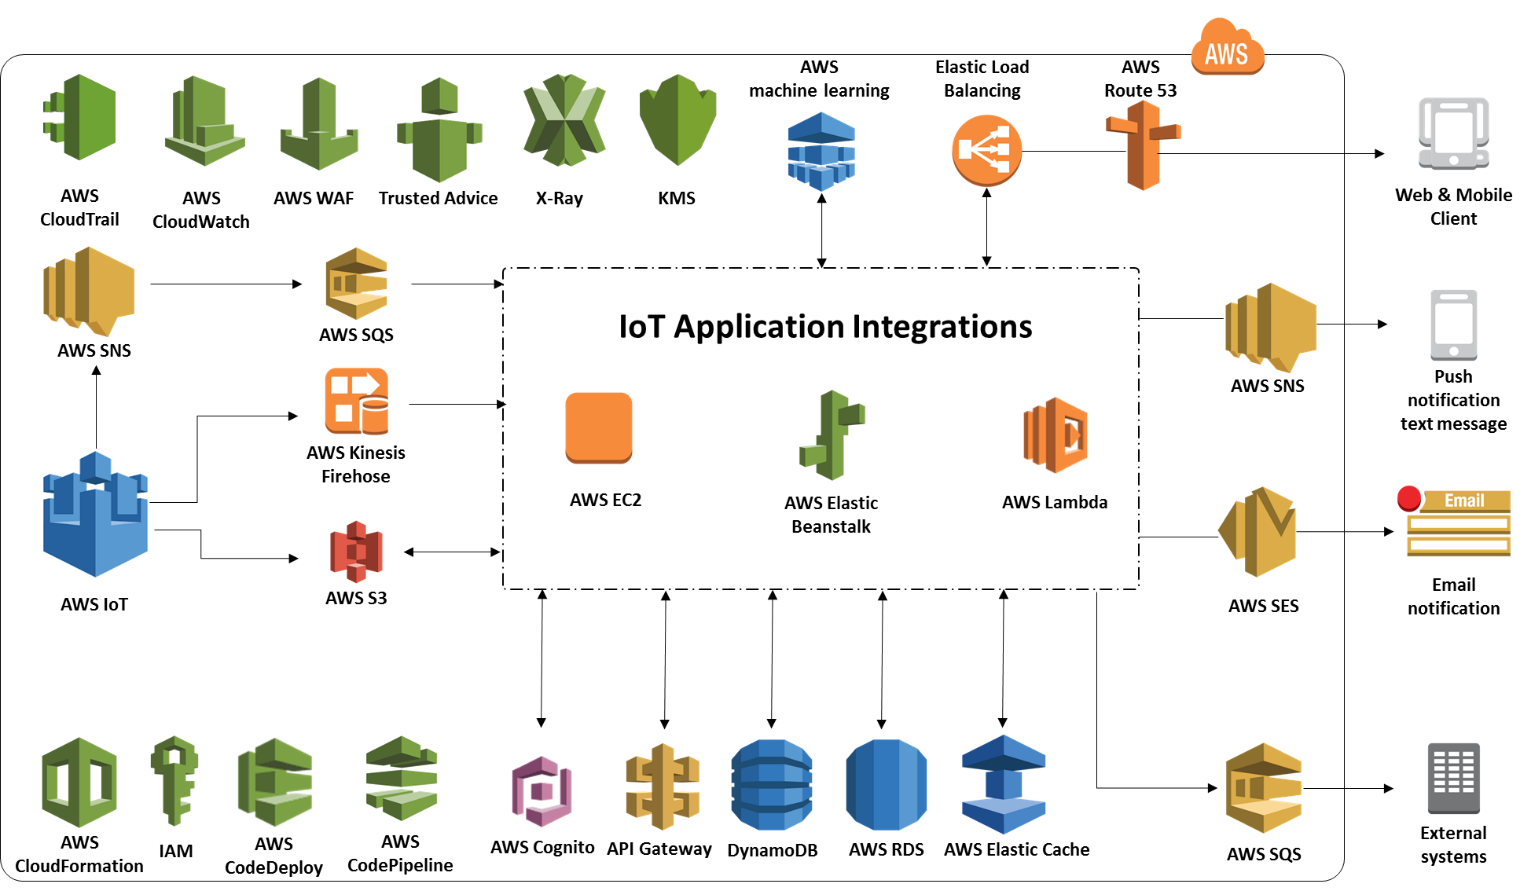 IoT Application Integrations